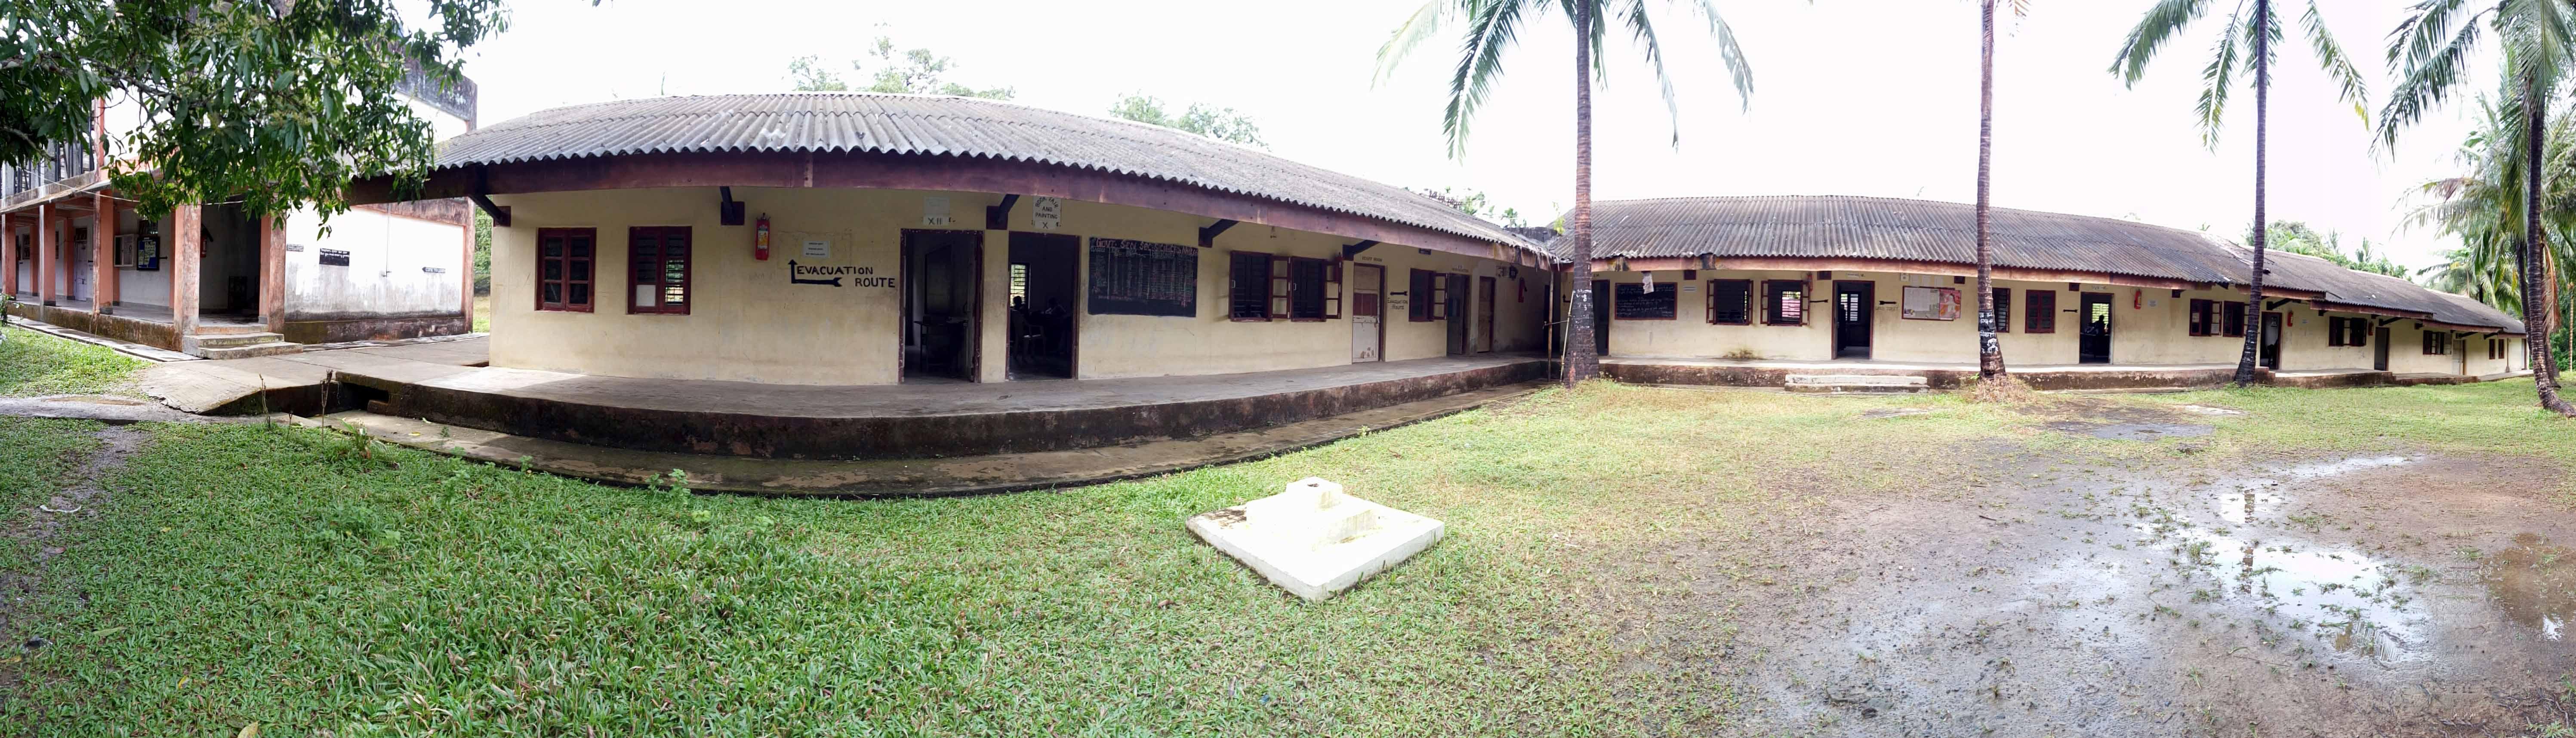 GOVERNMENT SECONDARY SCHOOL C F O NALLAH VIL DHARAMPUR PO BETAPUR A amp N ISLANDS 2520075